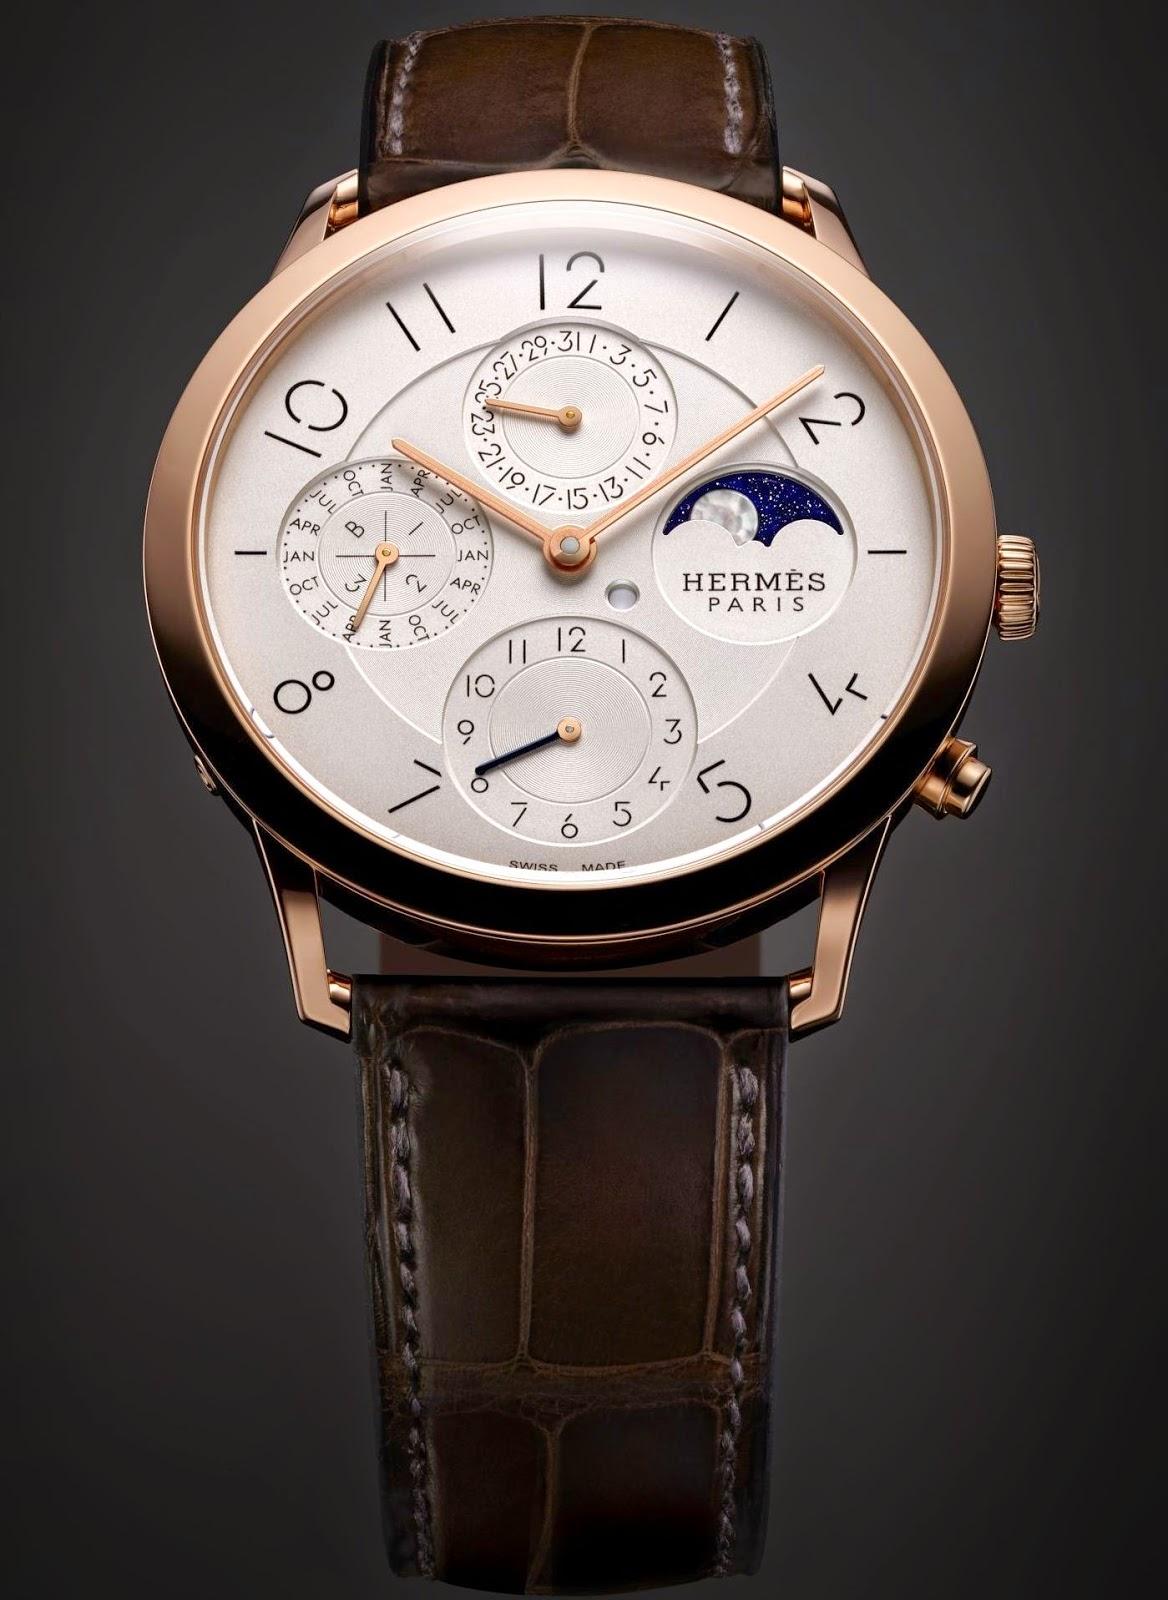 Hermès - Slim d'Hermès Perpetual Calendar watch rose gold version